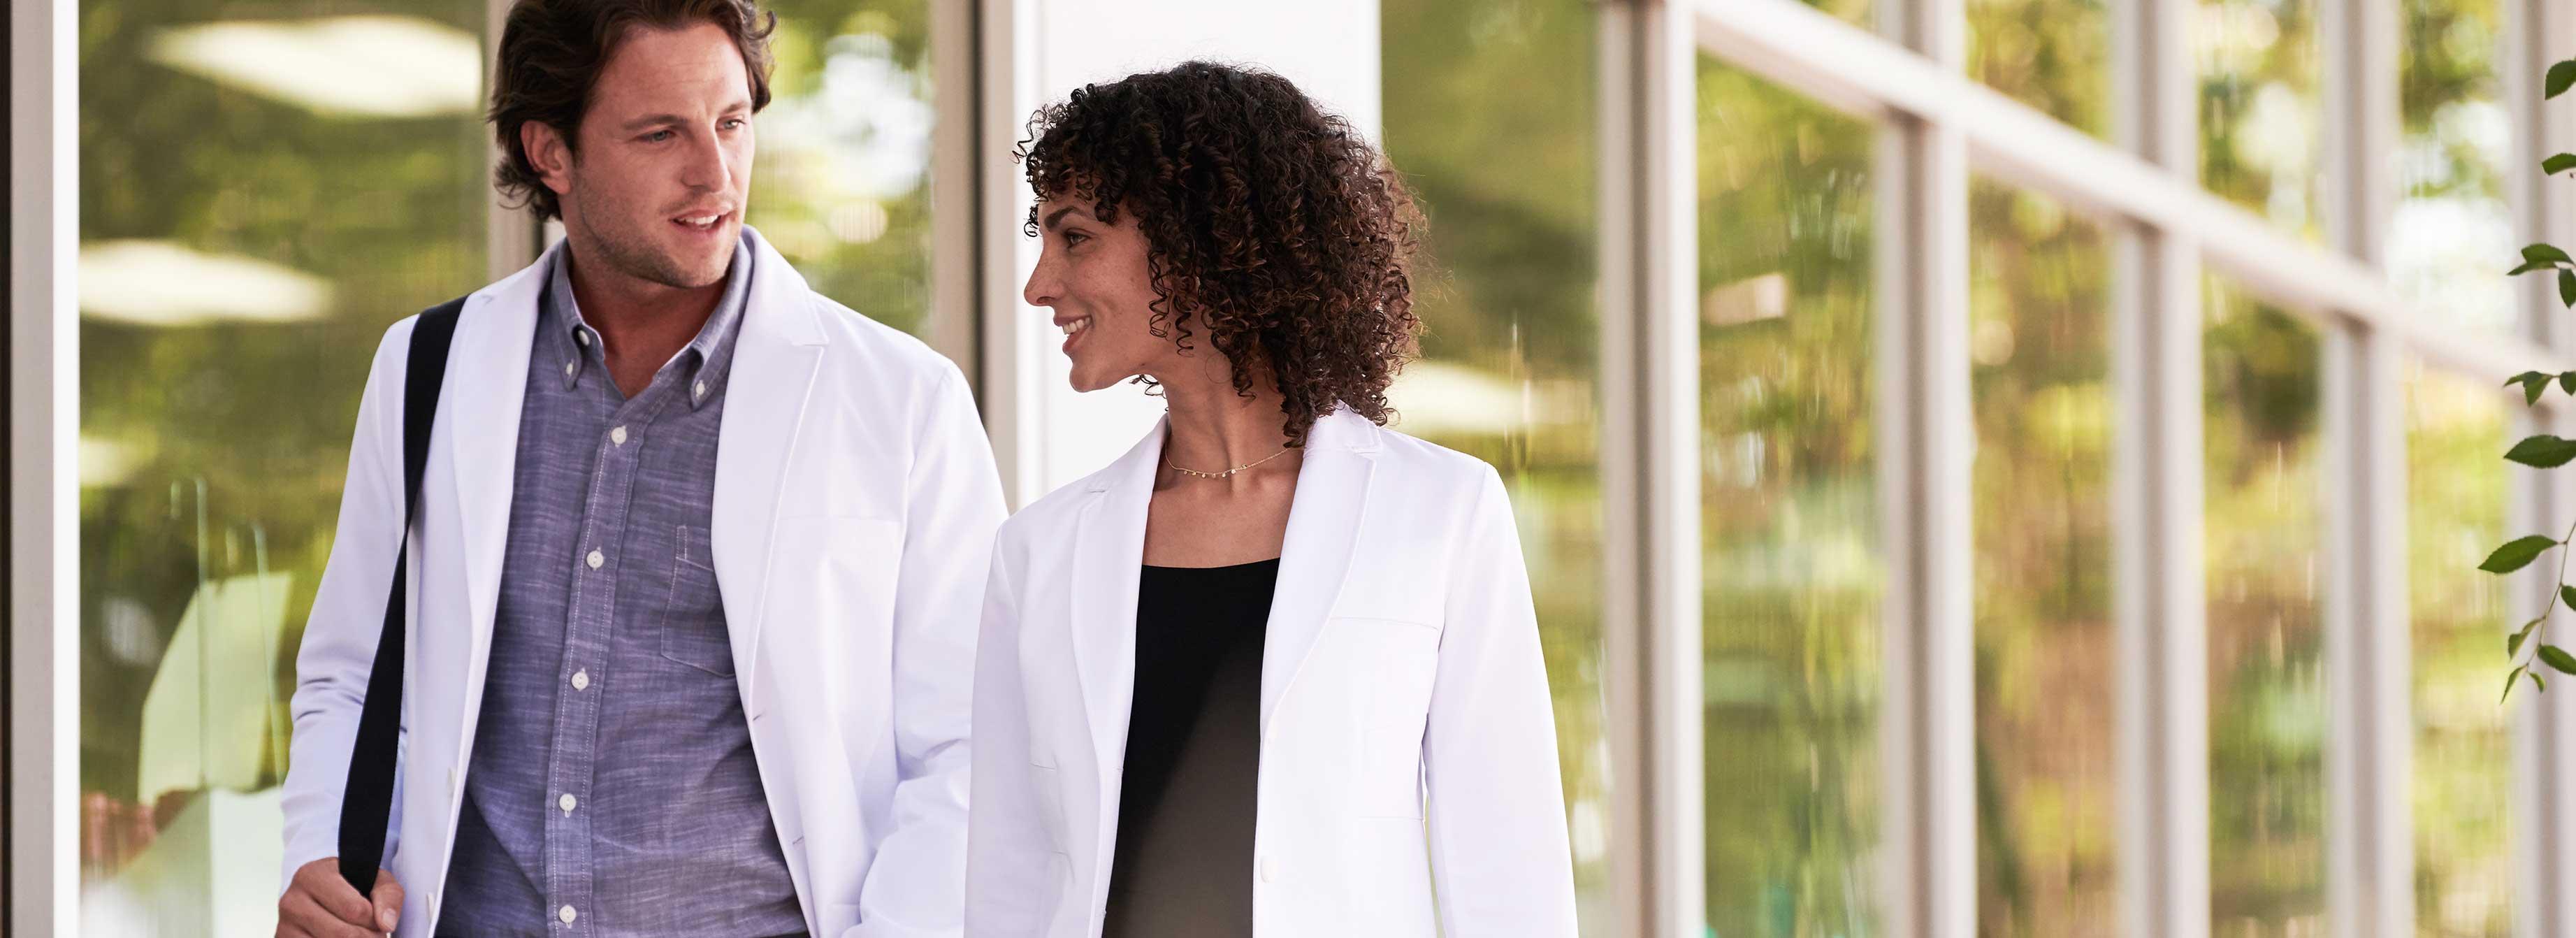 Pharmacist Lab Coats